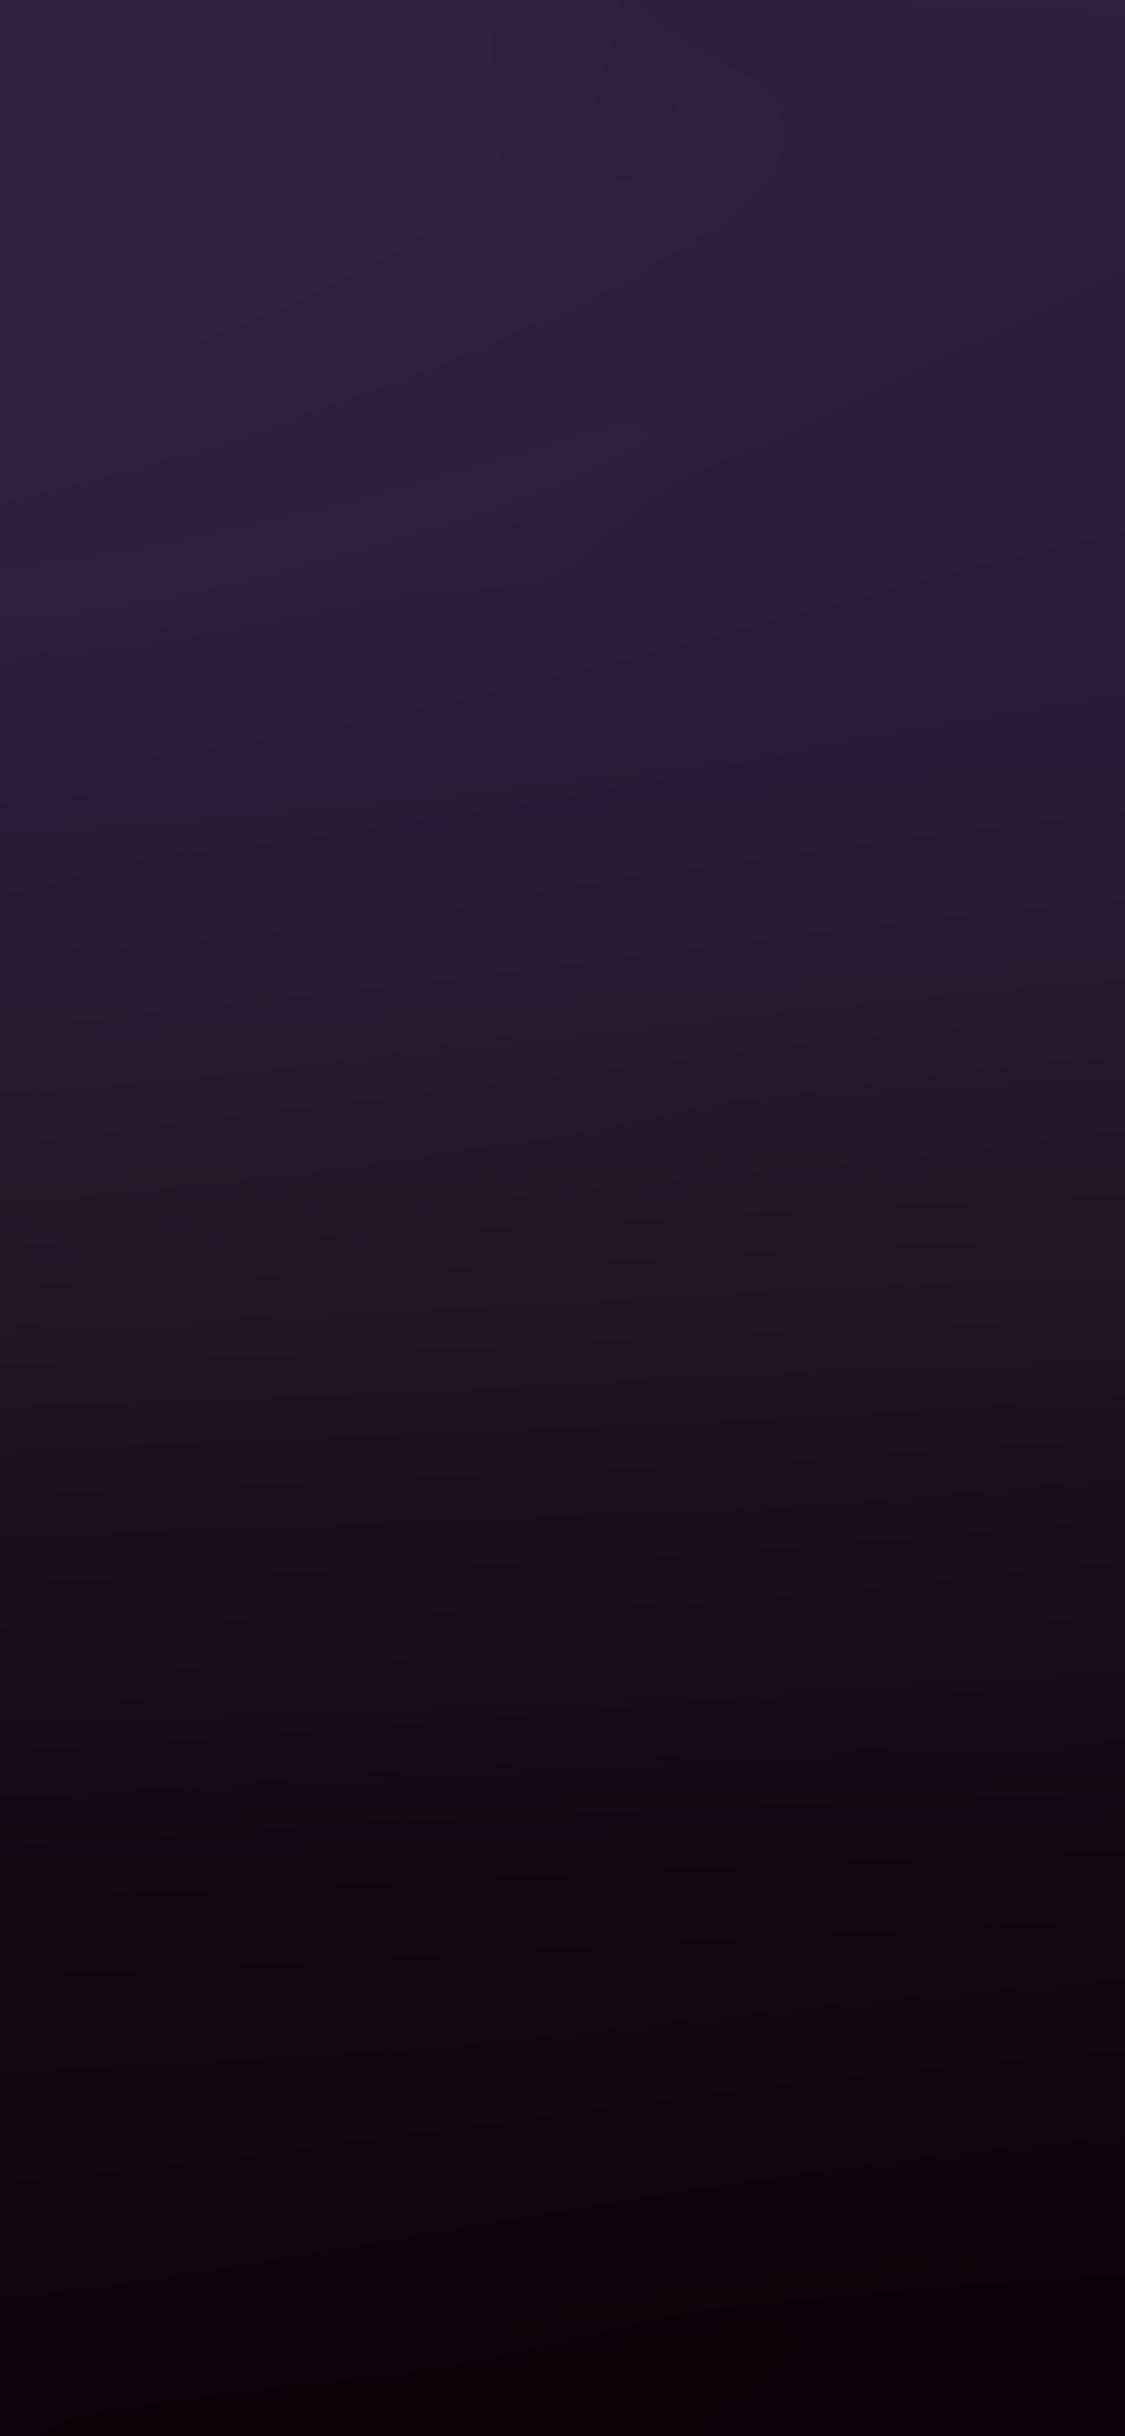 iPhonexpapers.com-Apple-iPhone-wallpaper-sm45-purple-dark-blur-gradation